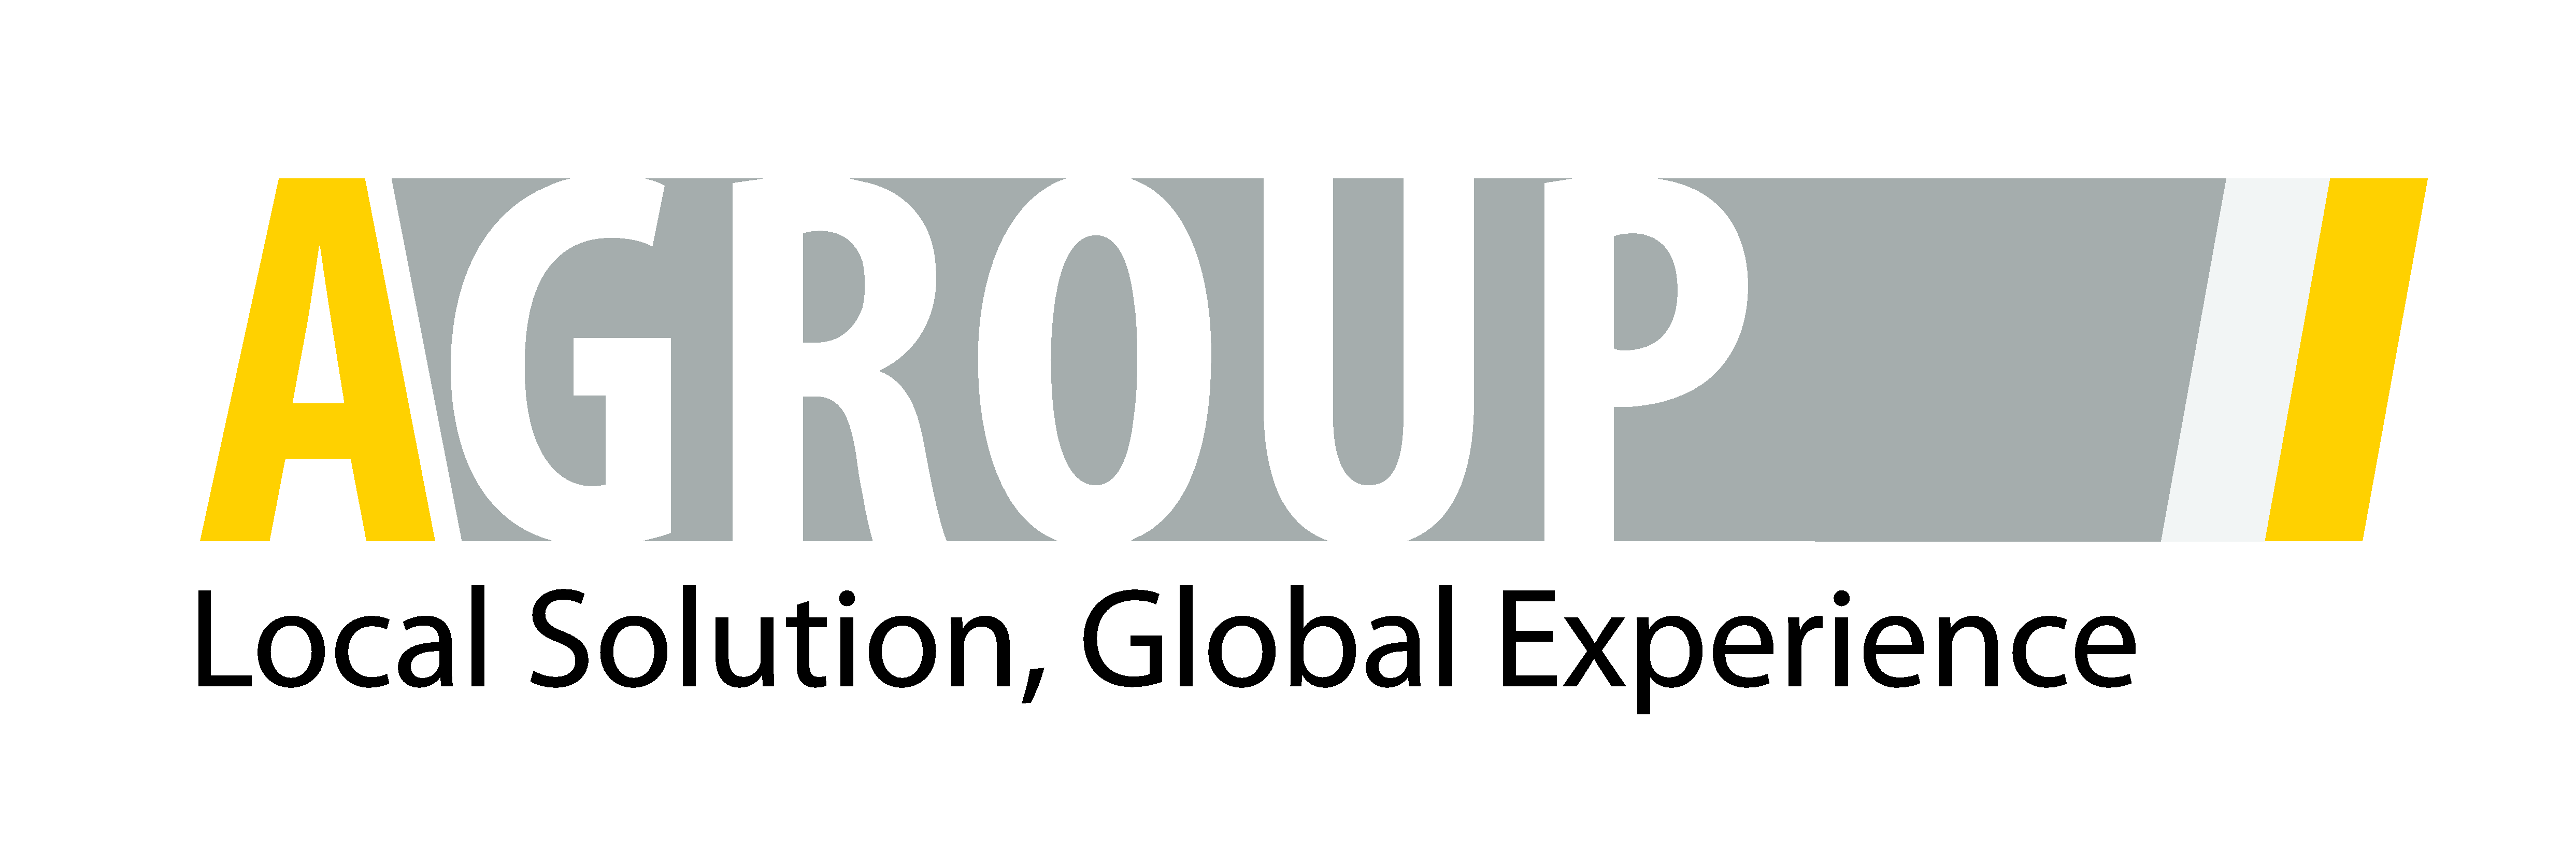 AGroup's logo